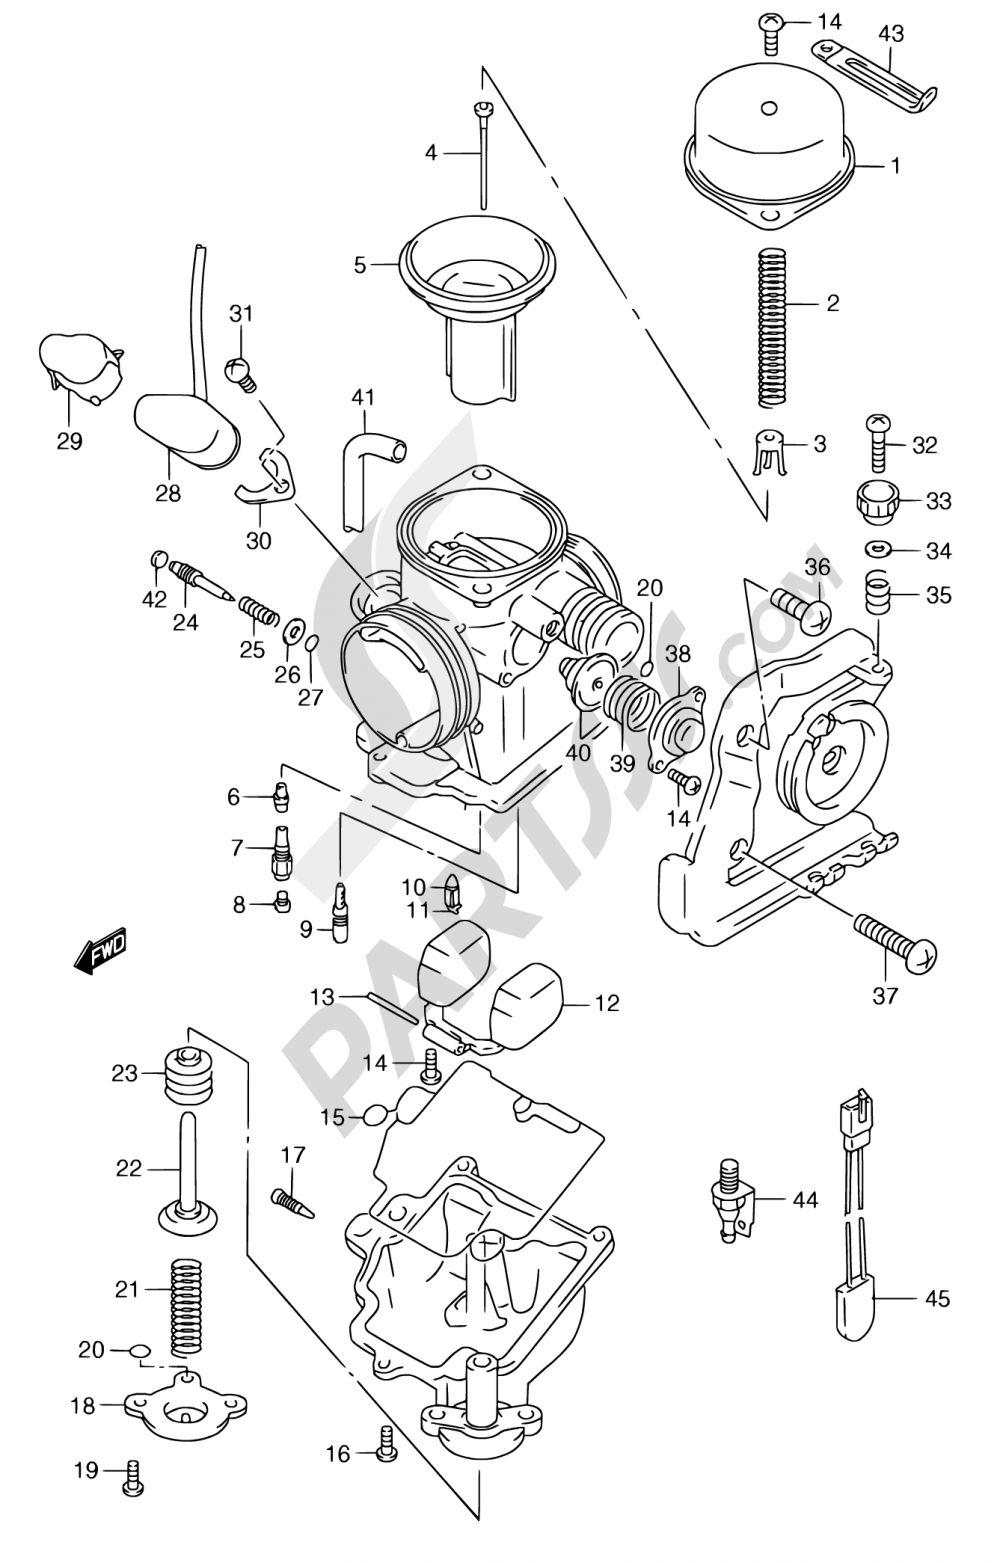 11 - CARBURETOR (MODEL W/X/Y) Suzuki BURGMAN AN250 2000